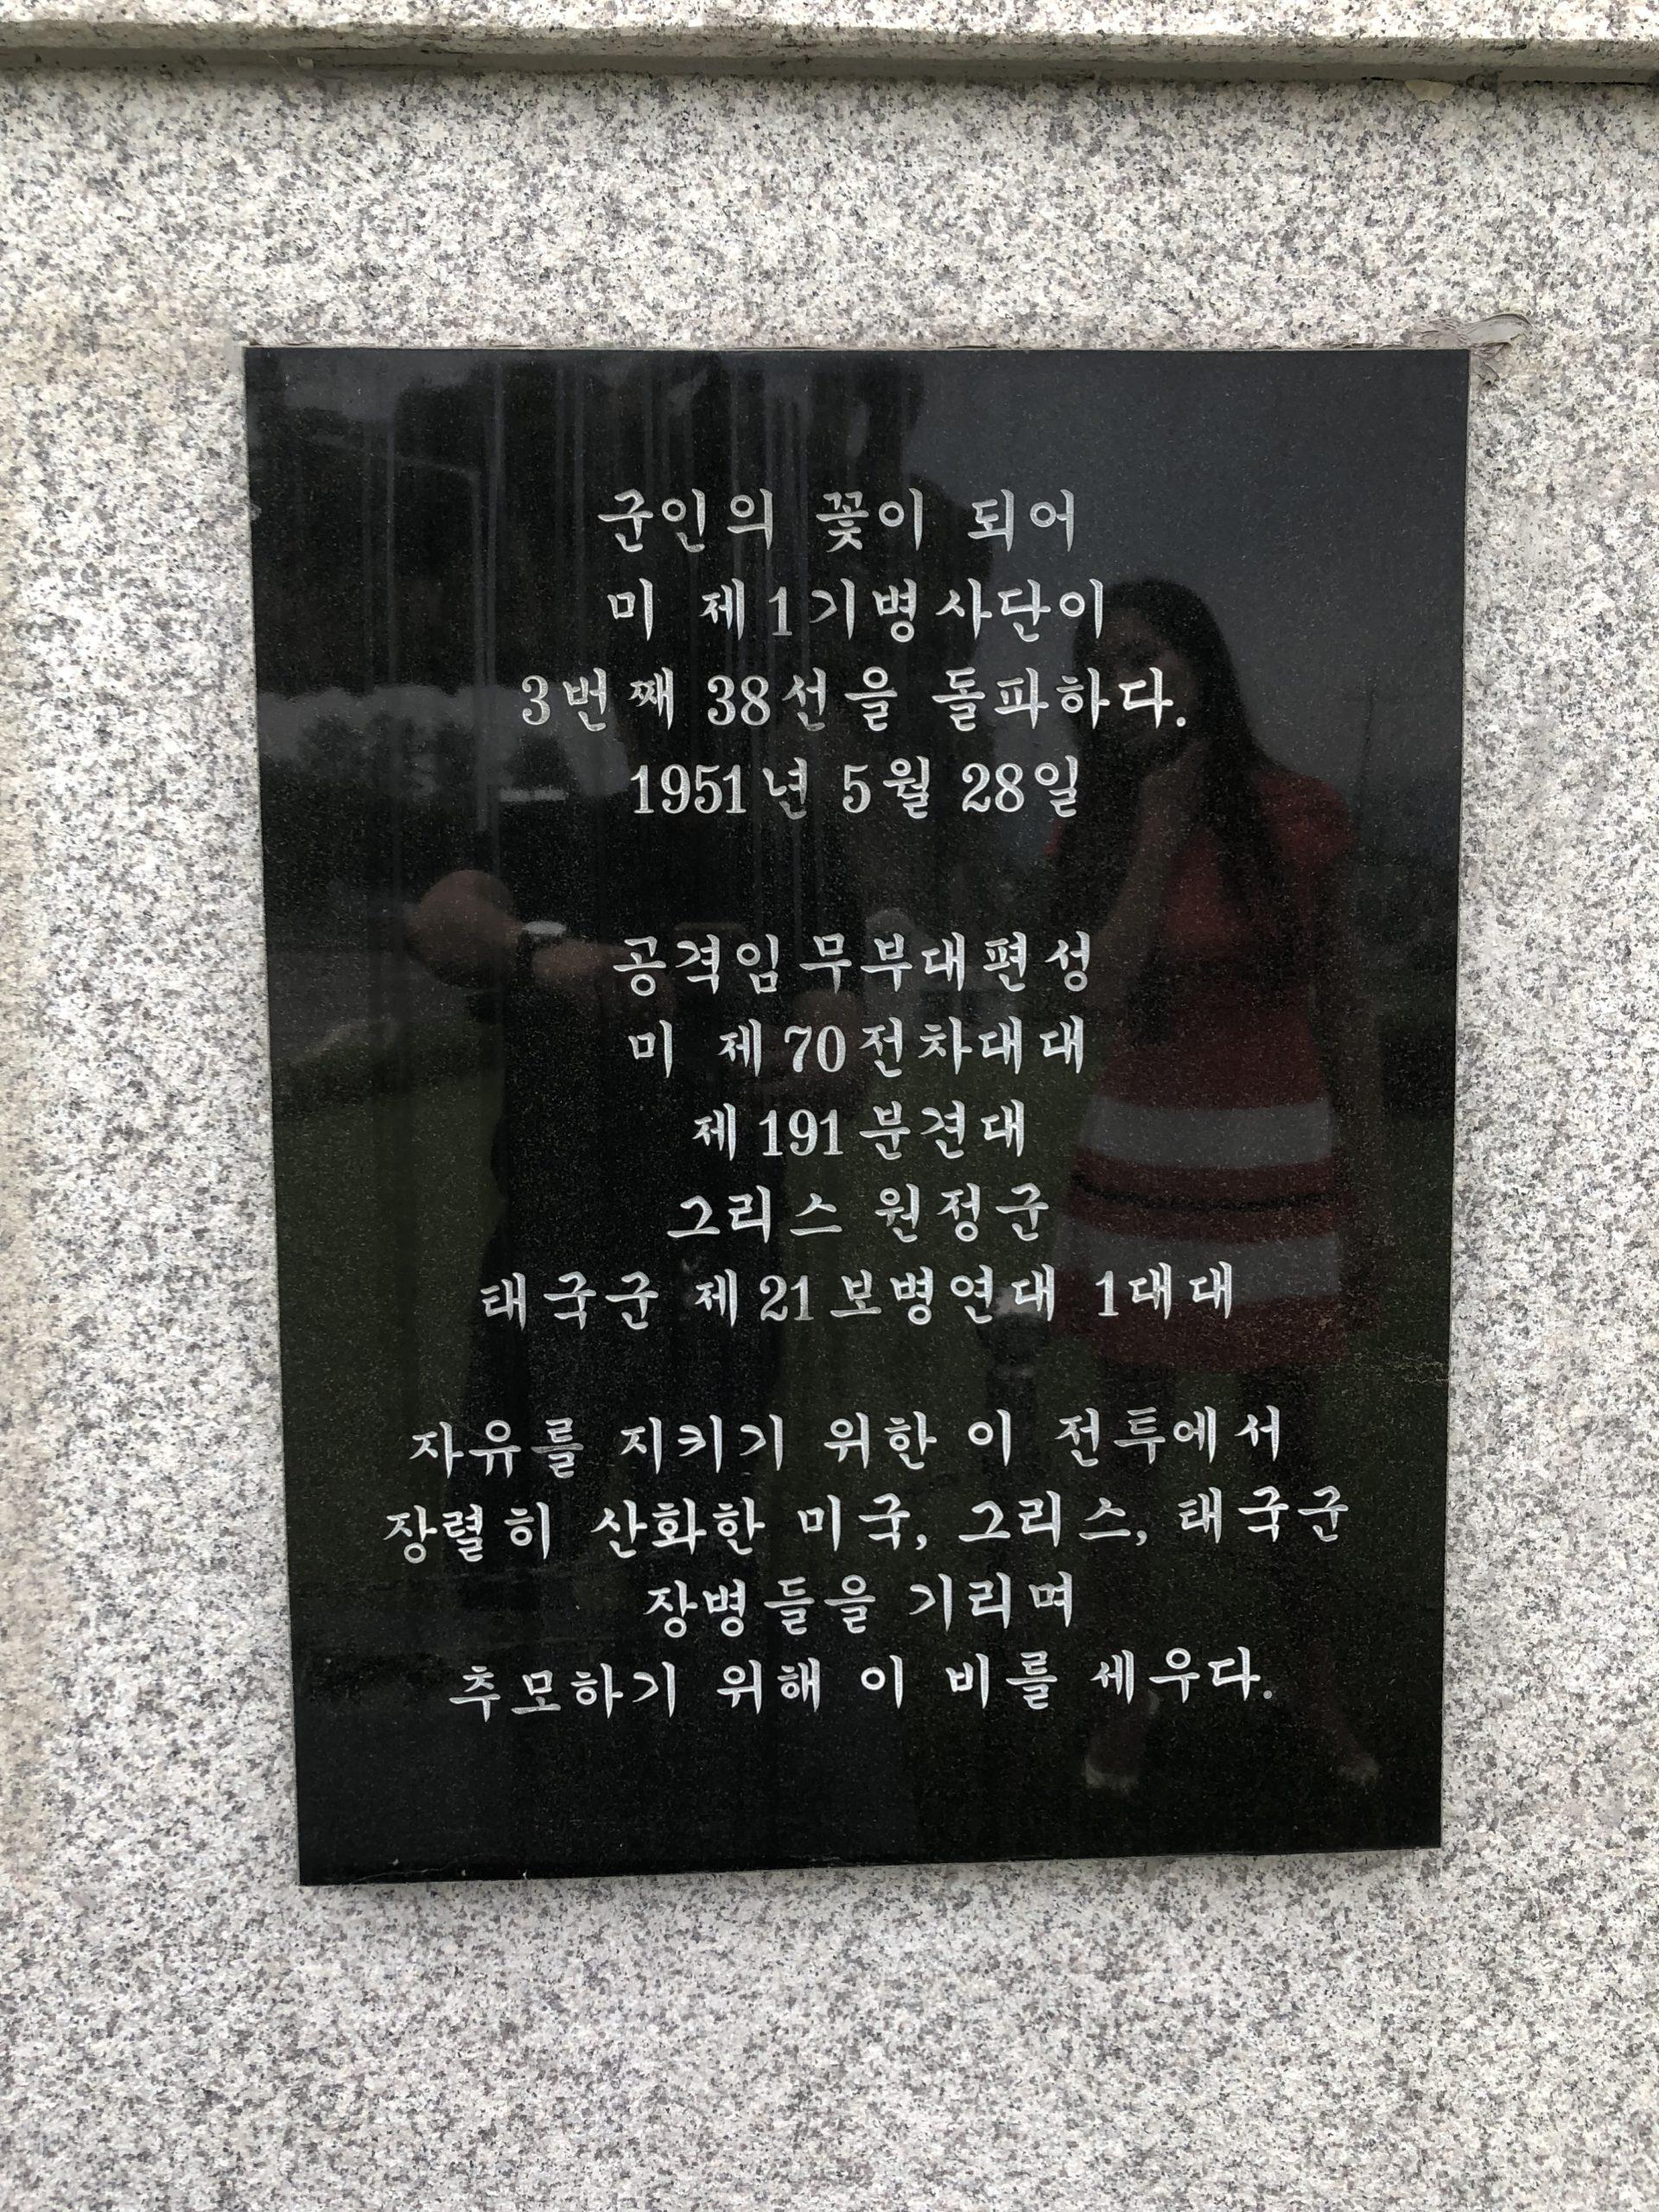 Yeoncheon